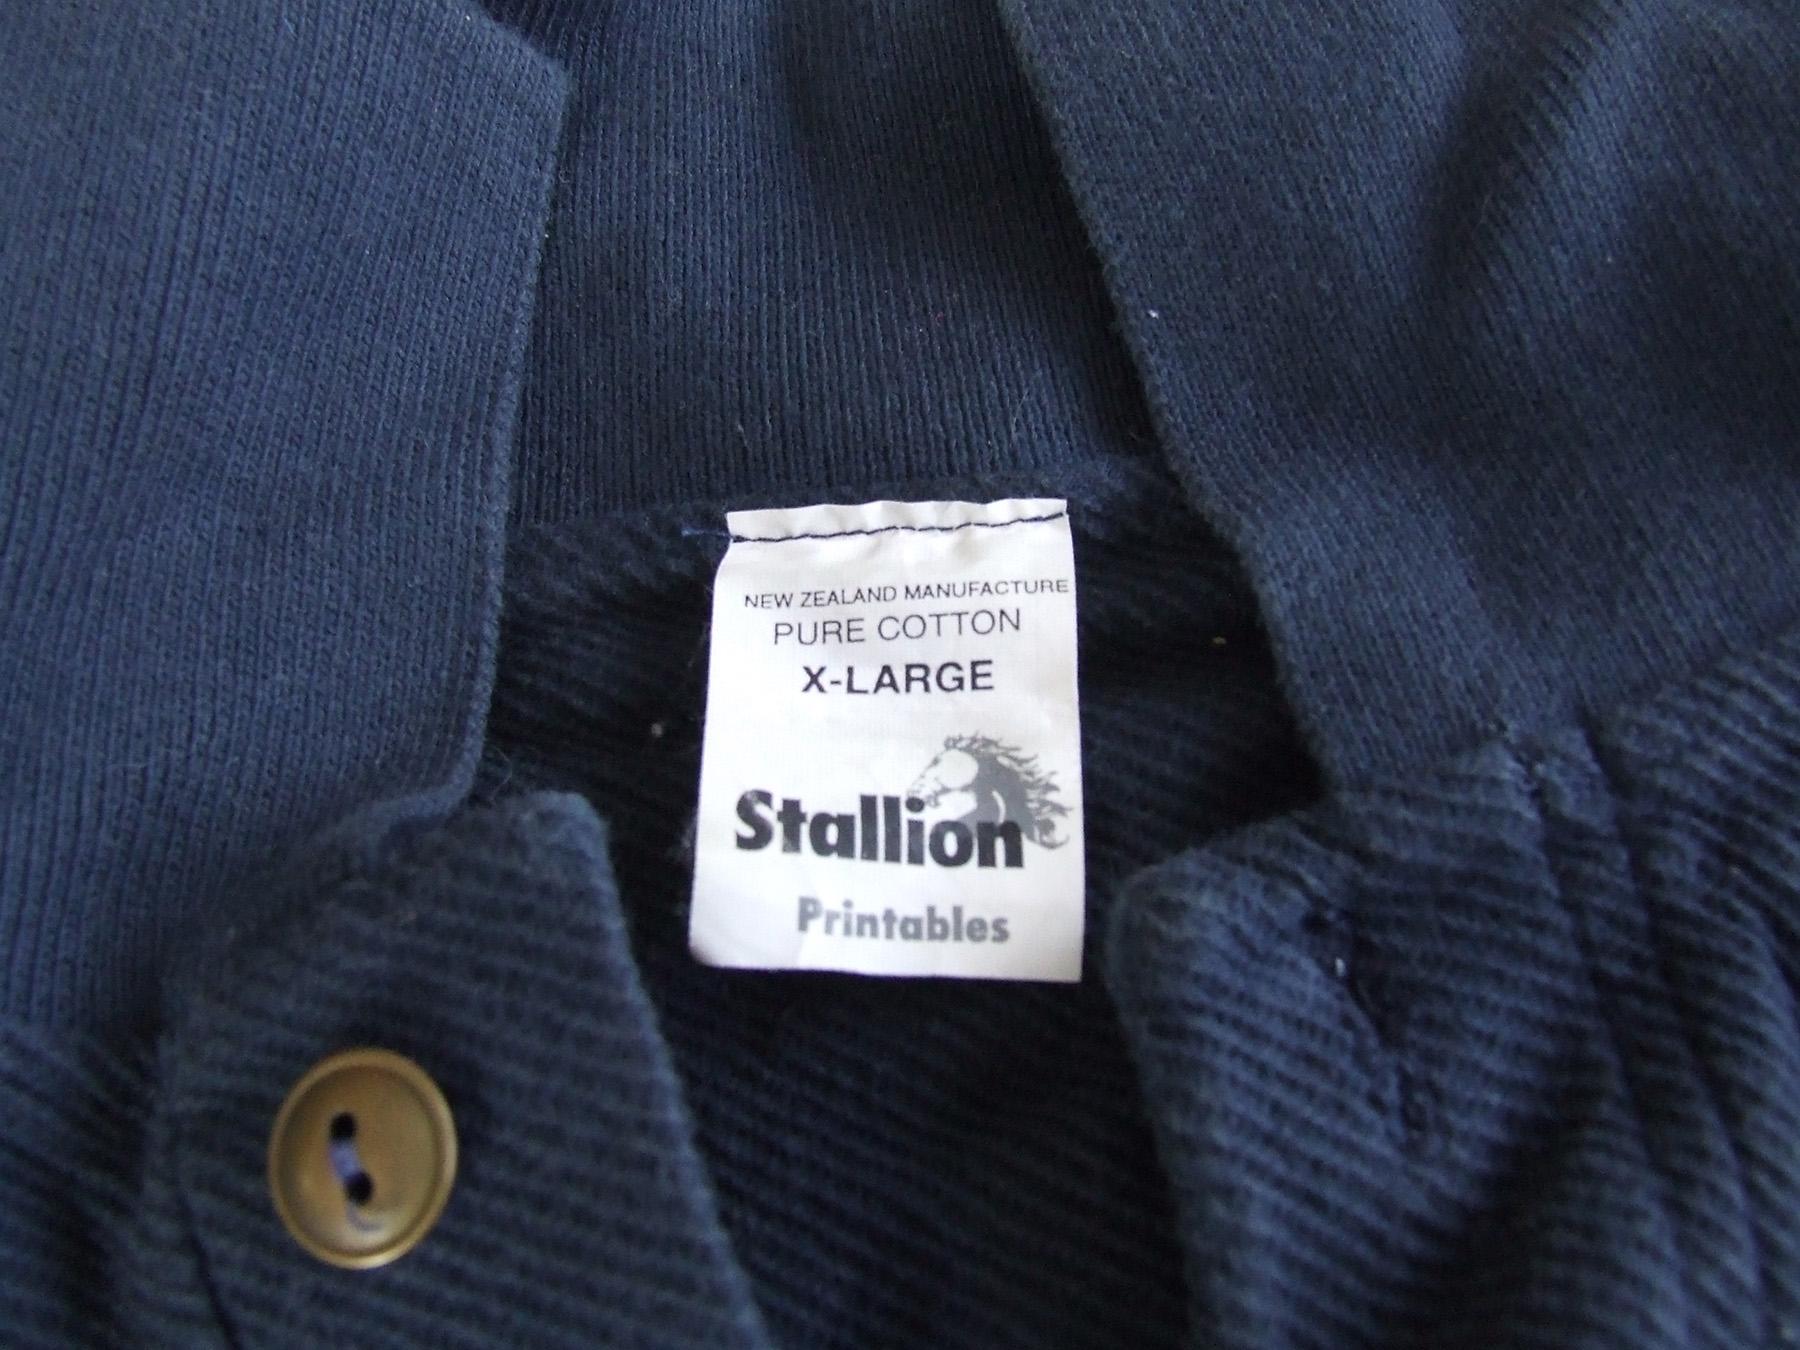 Pepsi Employee Shirt (NZ, 1999)